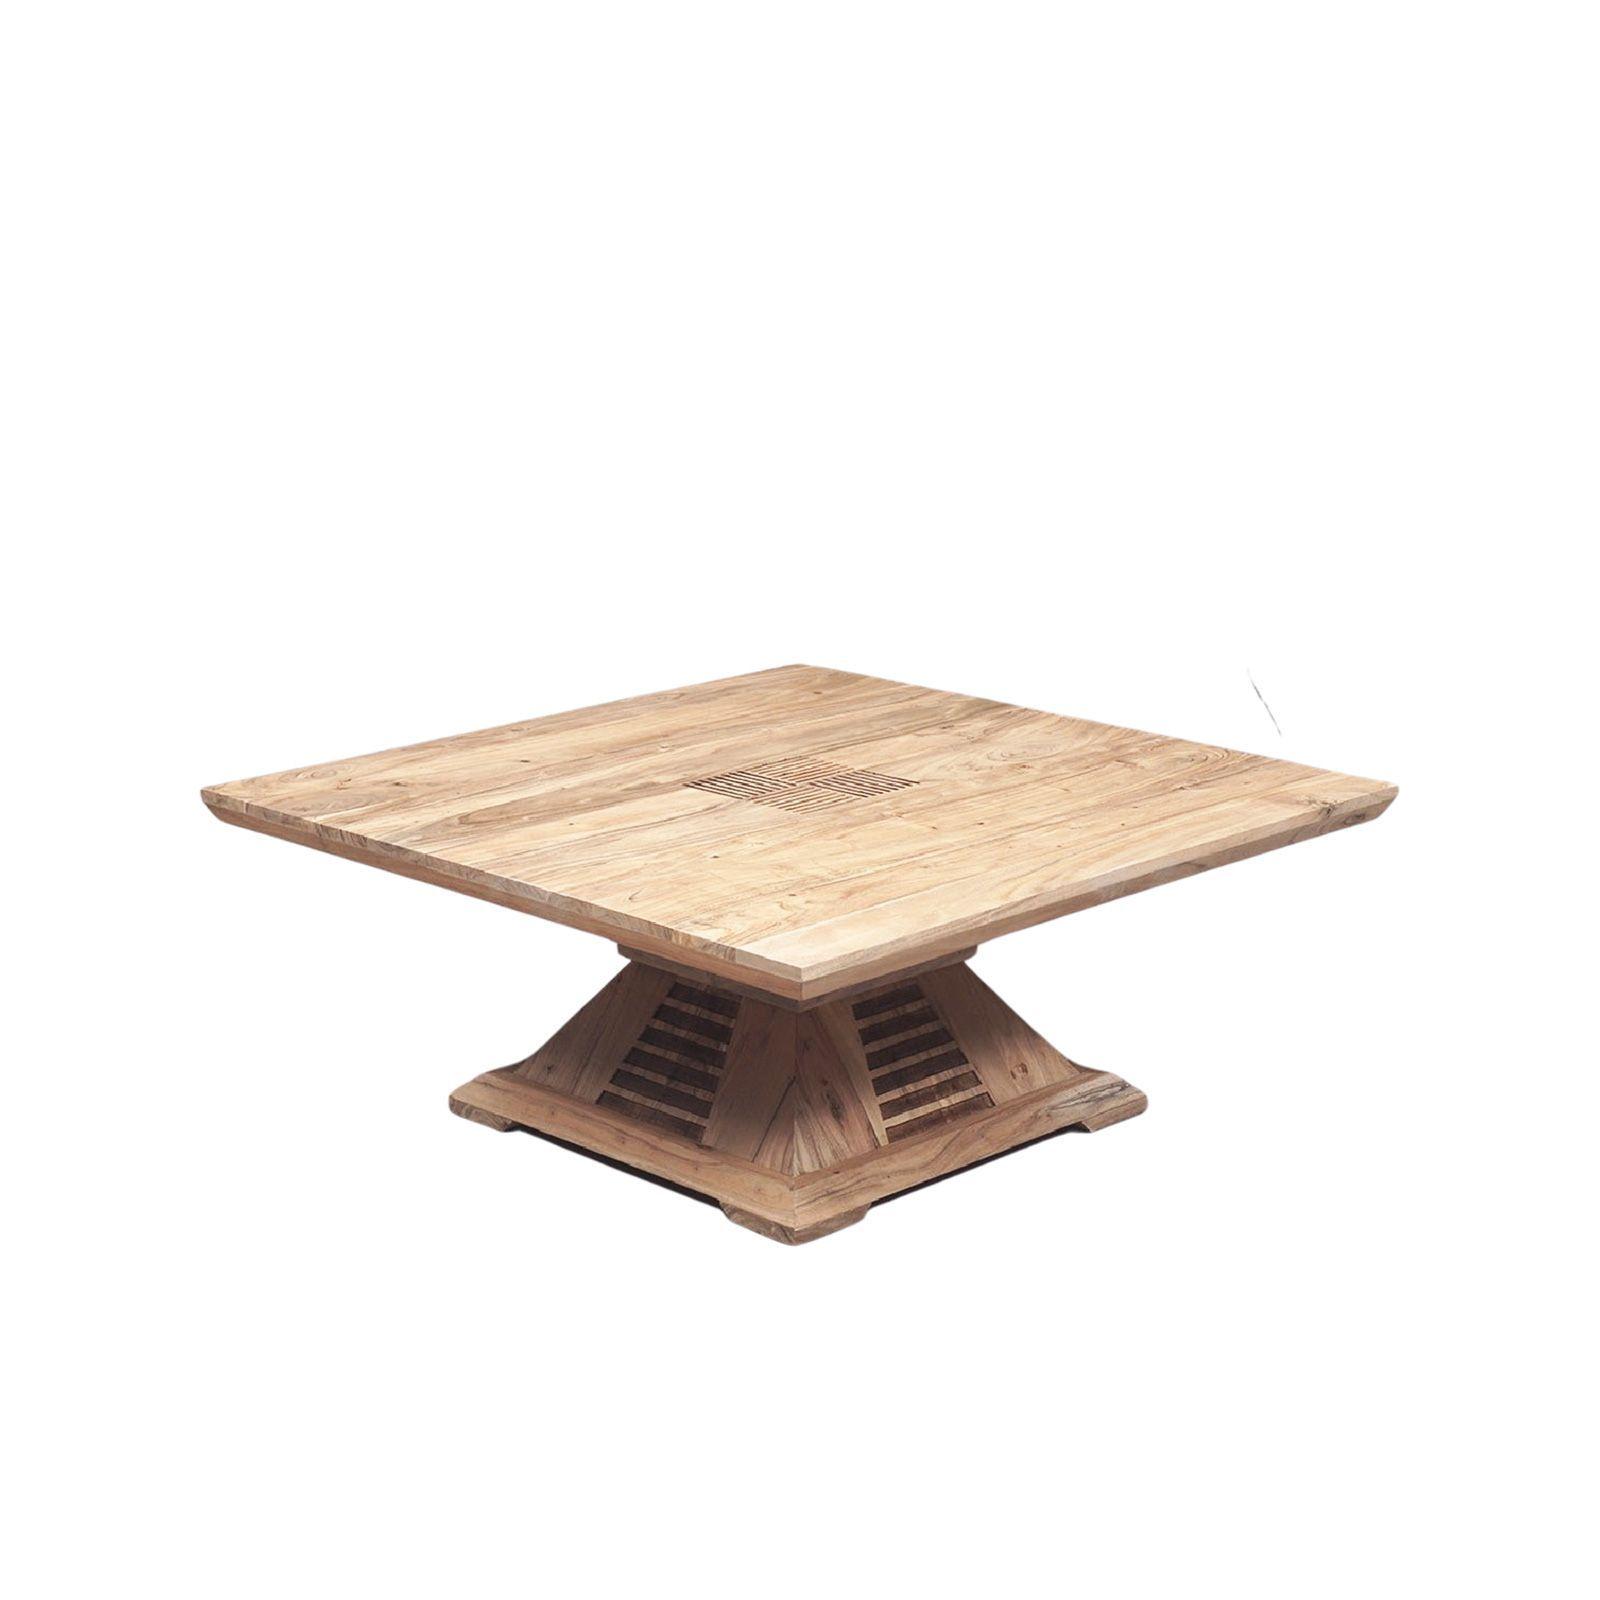 Table basse bois bicolore